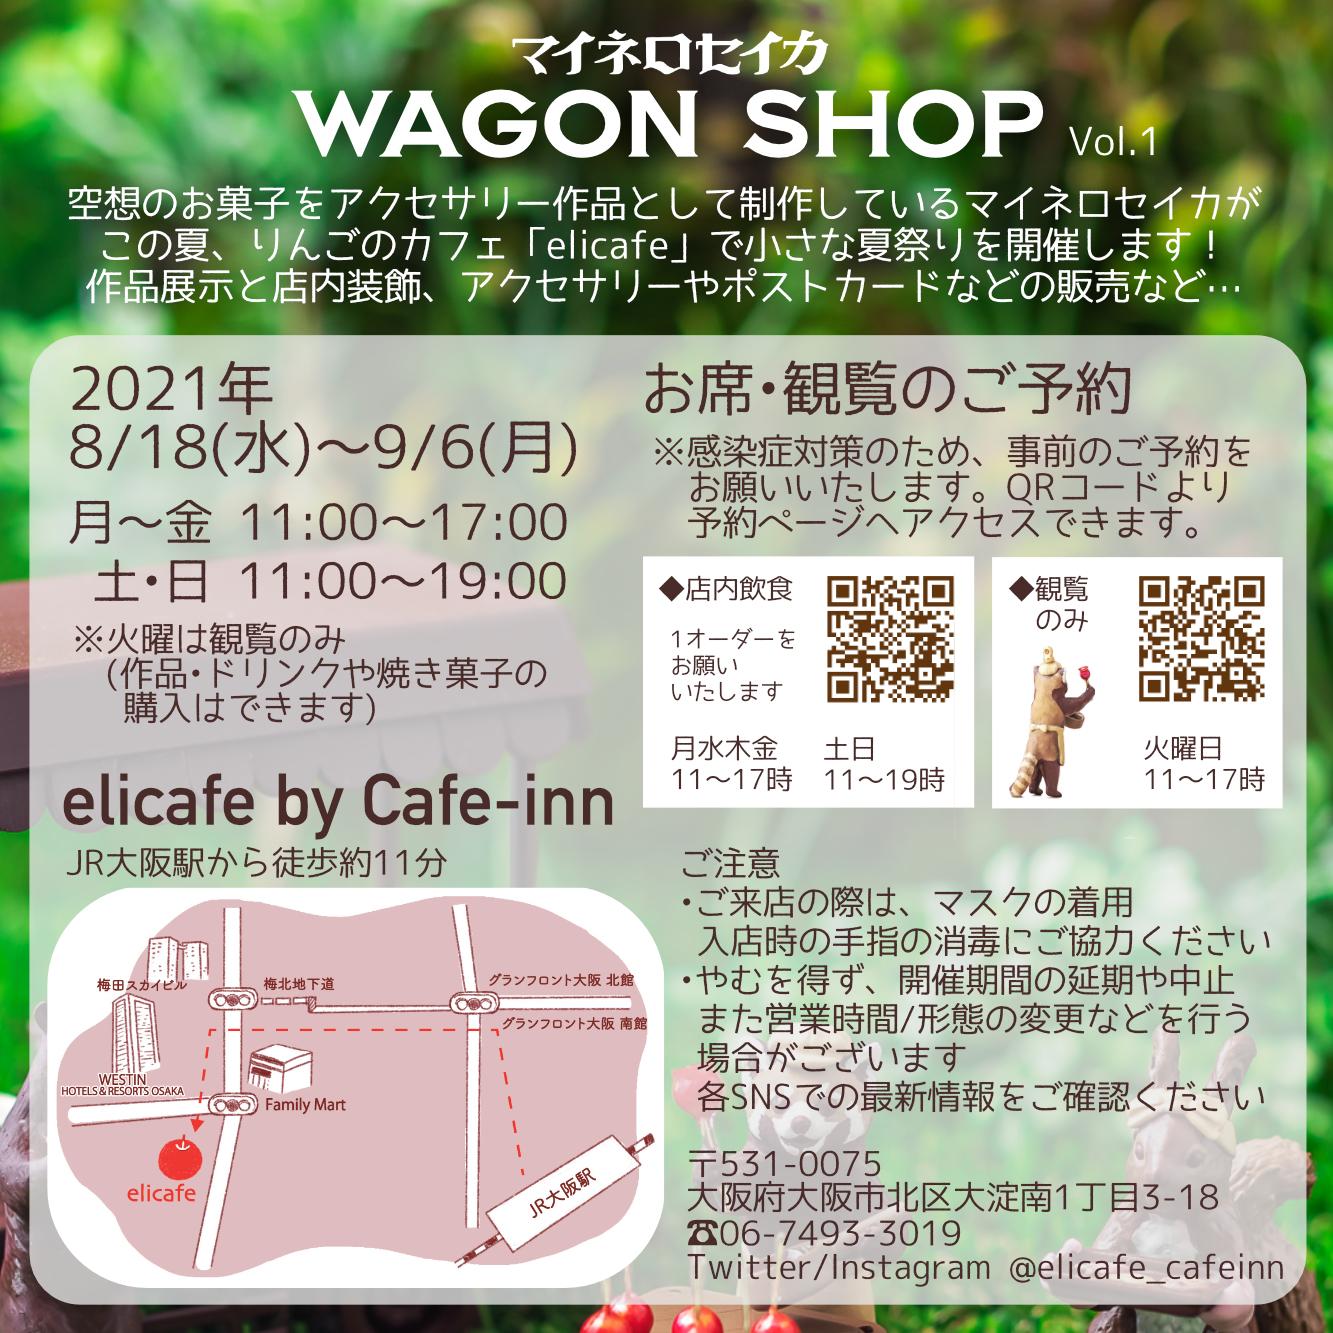 wagon-shop1-B.jpg